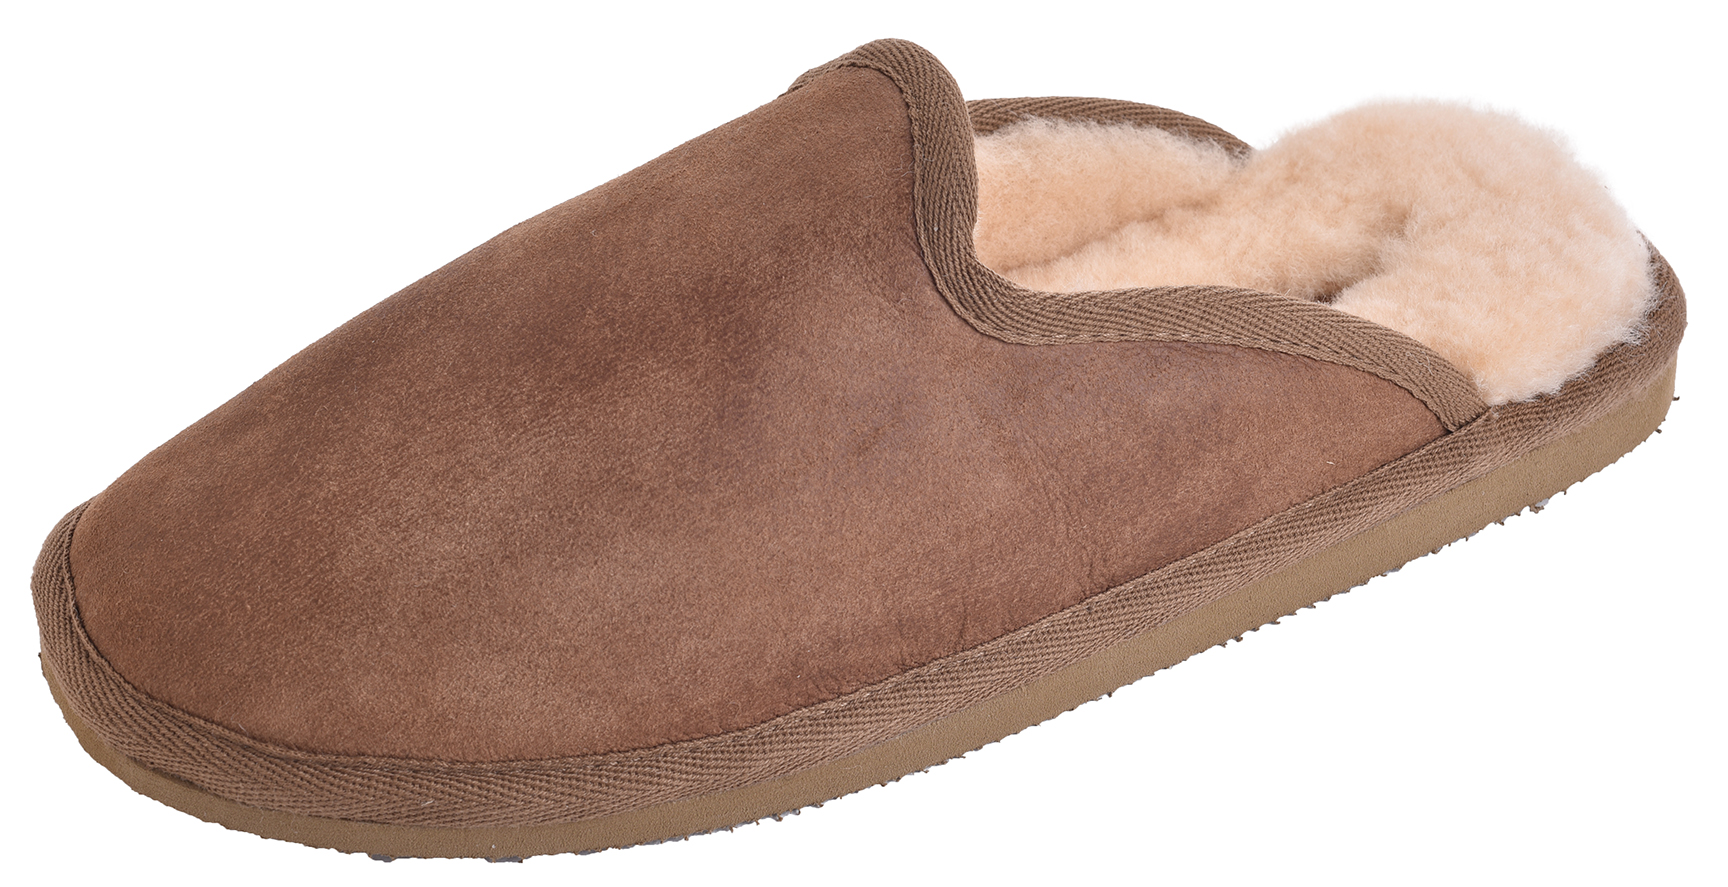 Mens Genuine Sheepskin Slipper Mules with EVA Sole by Shepherd - Paul